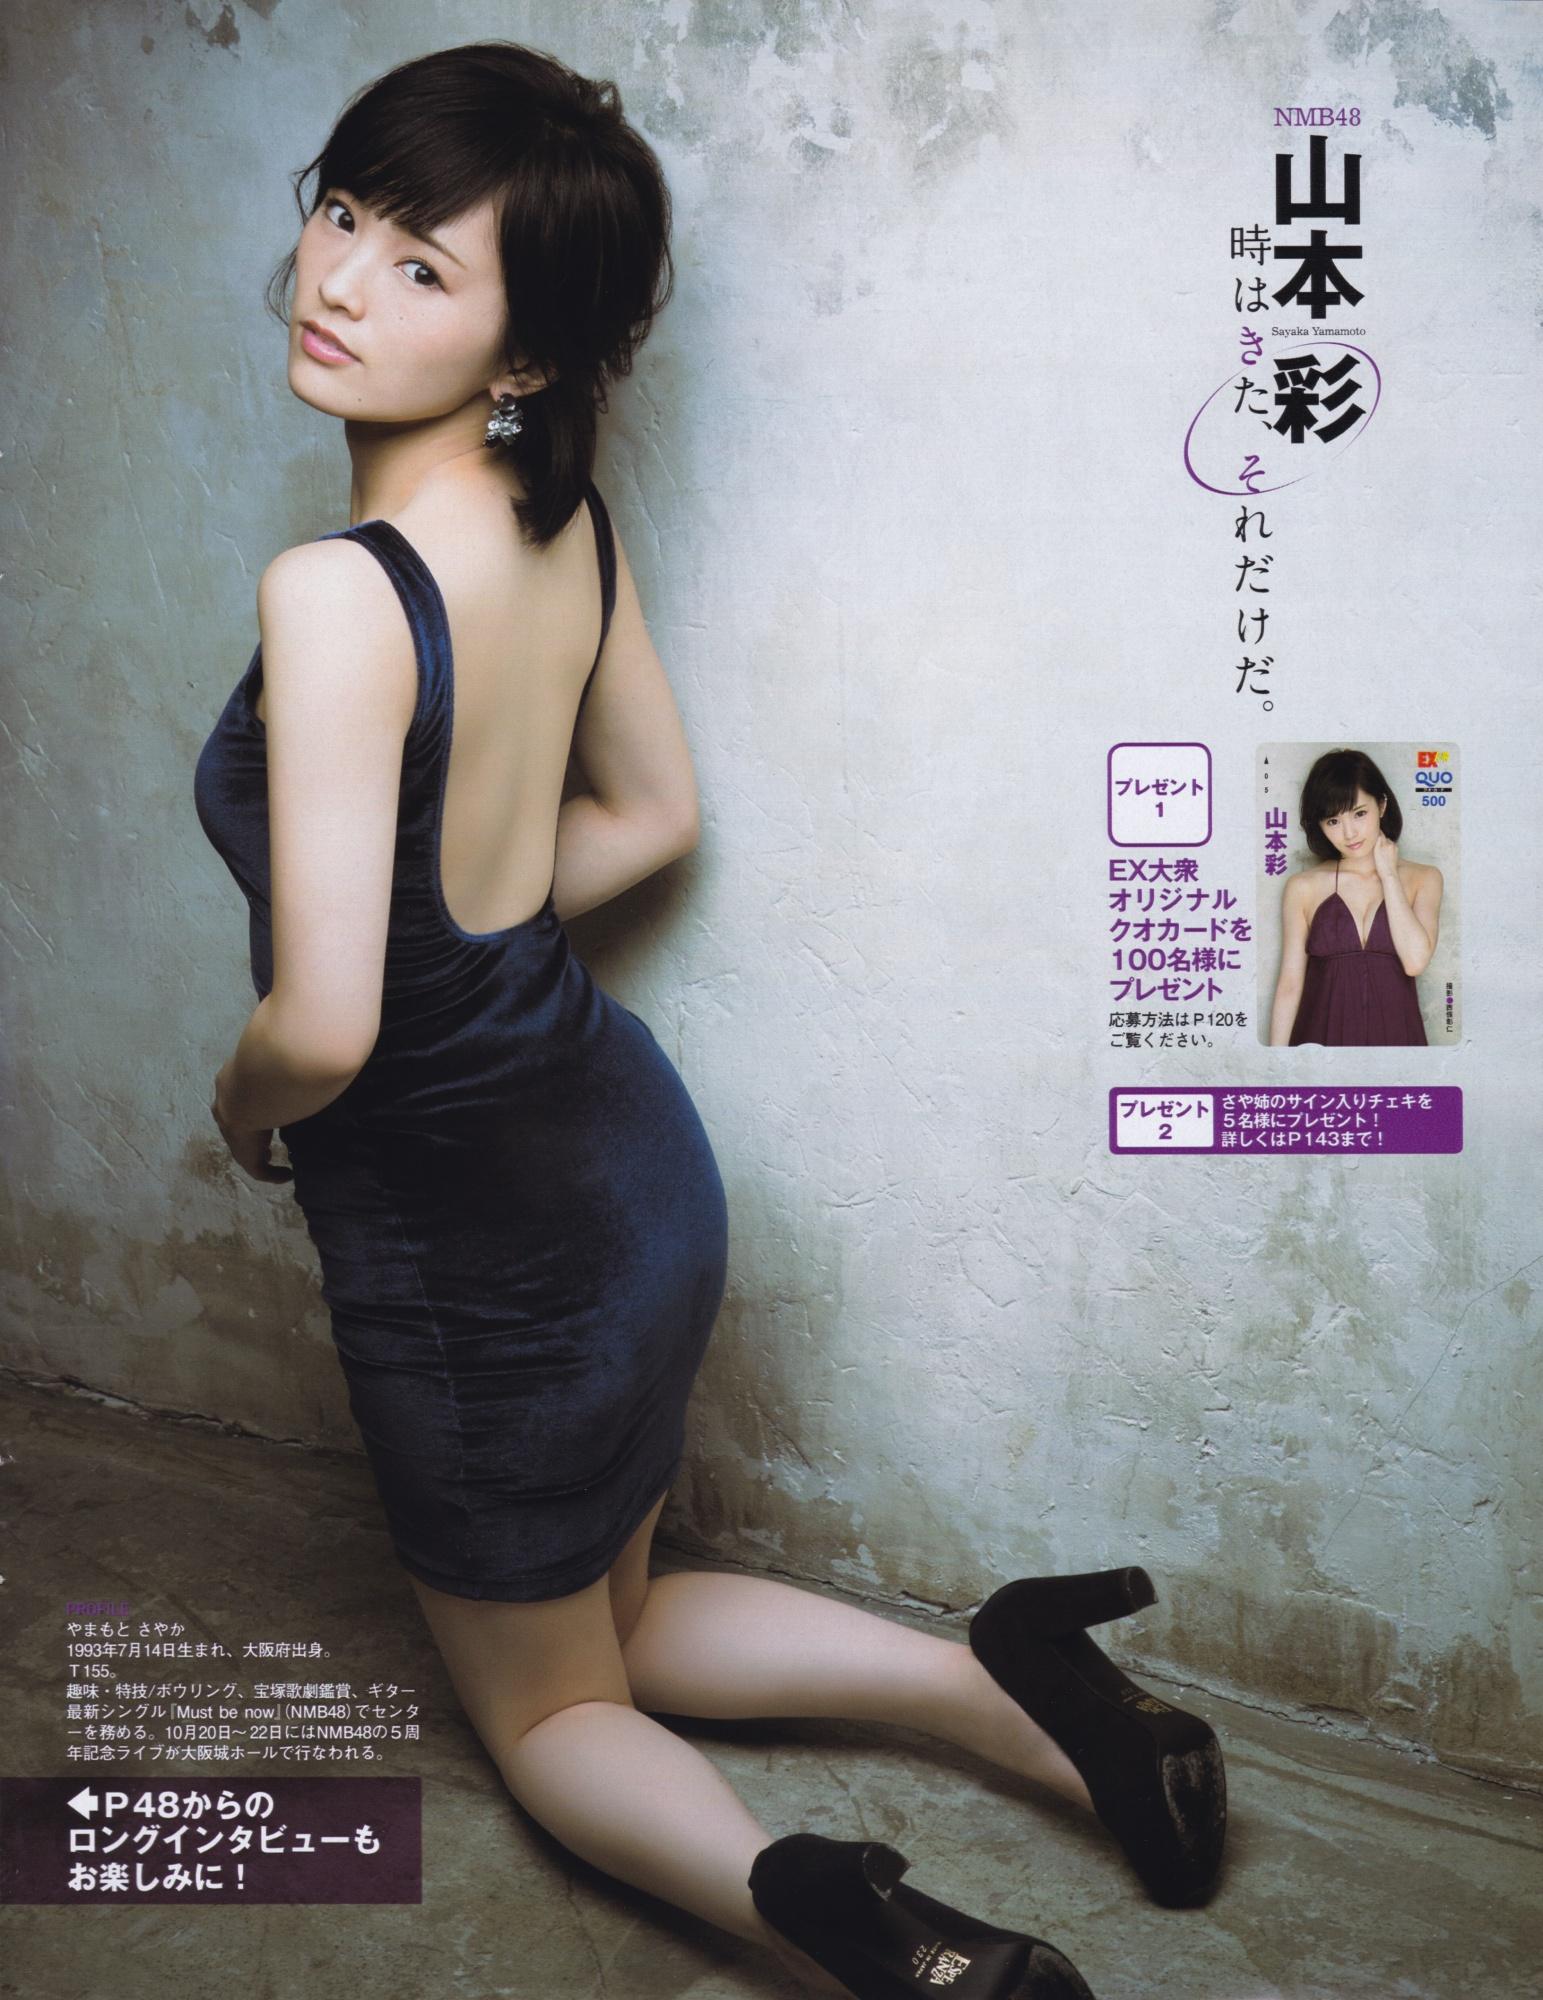 Sayaka Yamamoto Android Iphone Wallpaper 36823 Asiachan